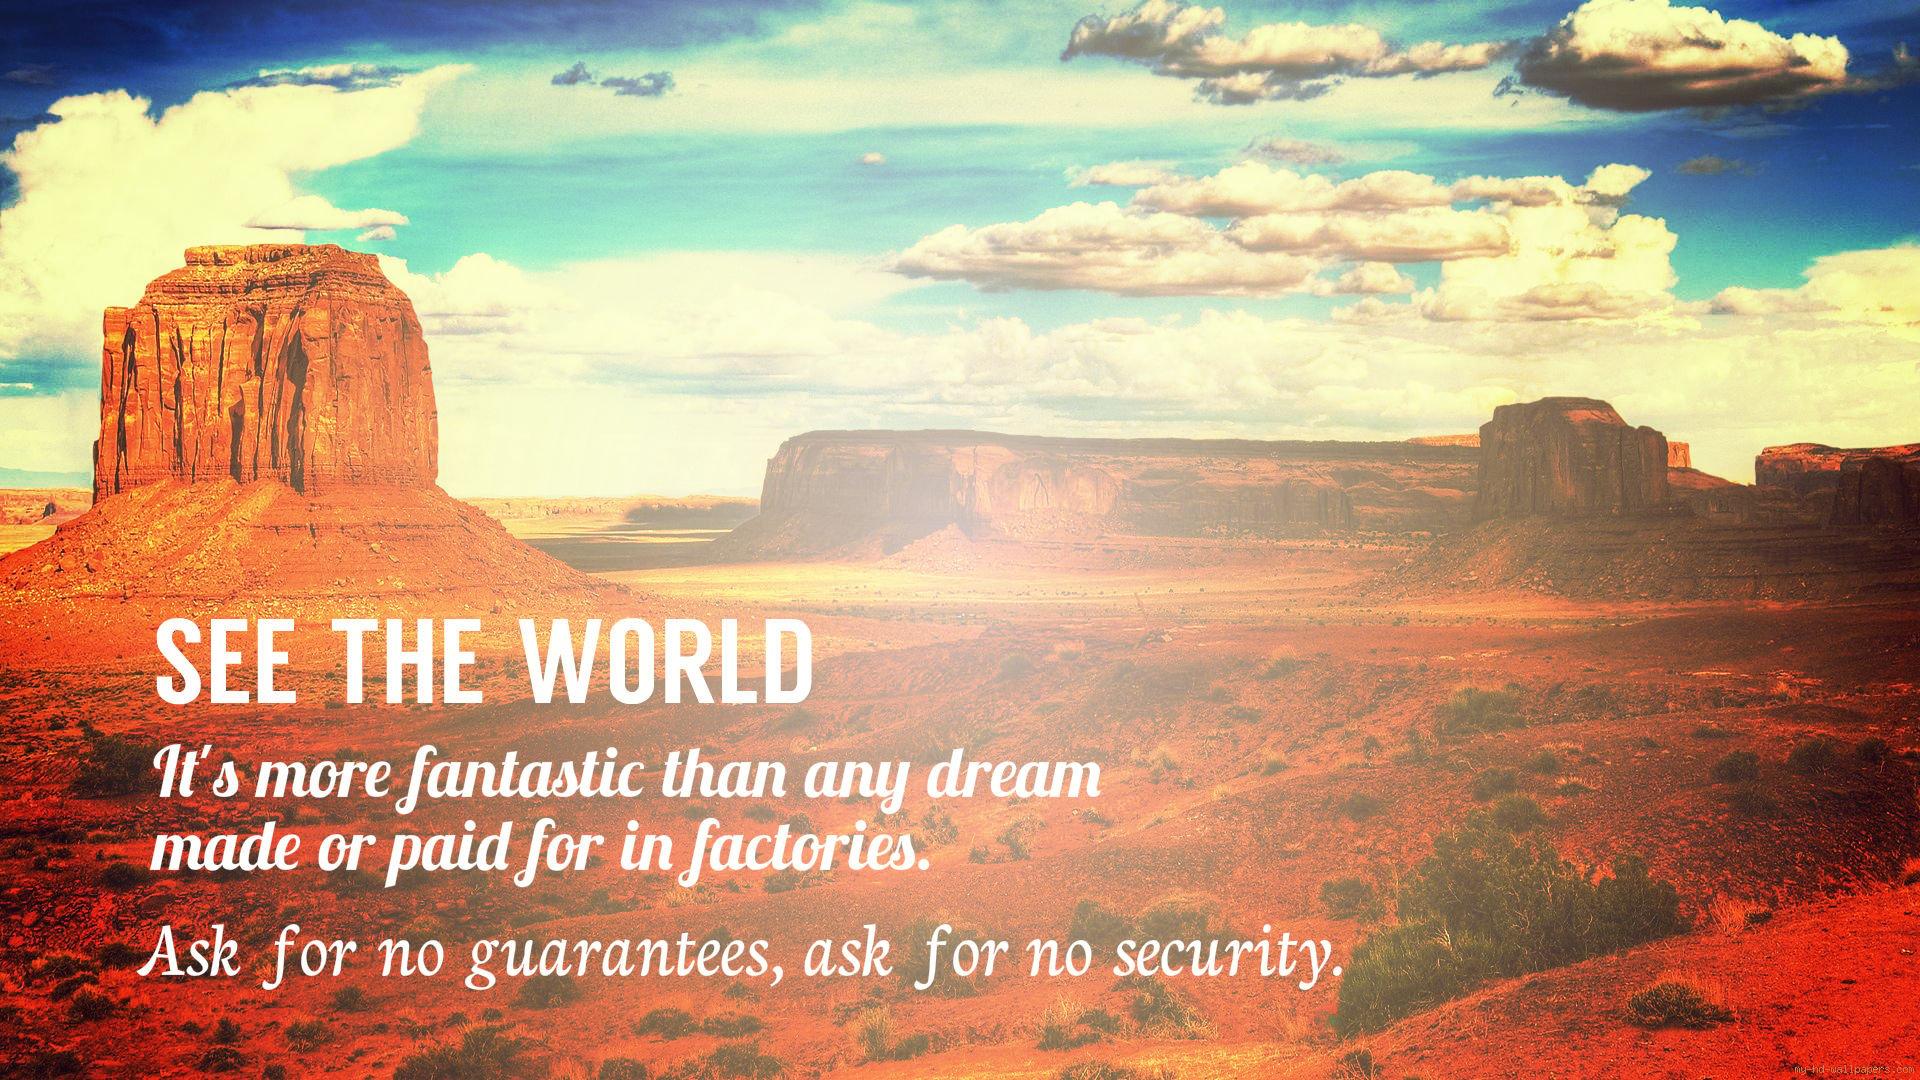 Travel quotes (11)